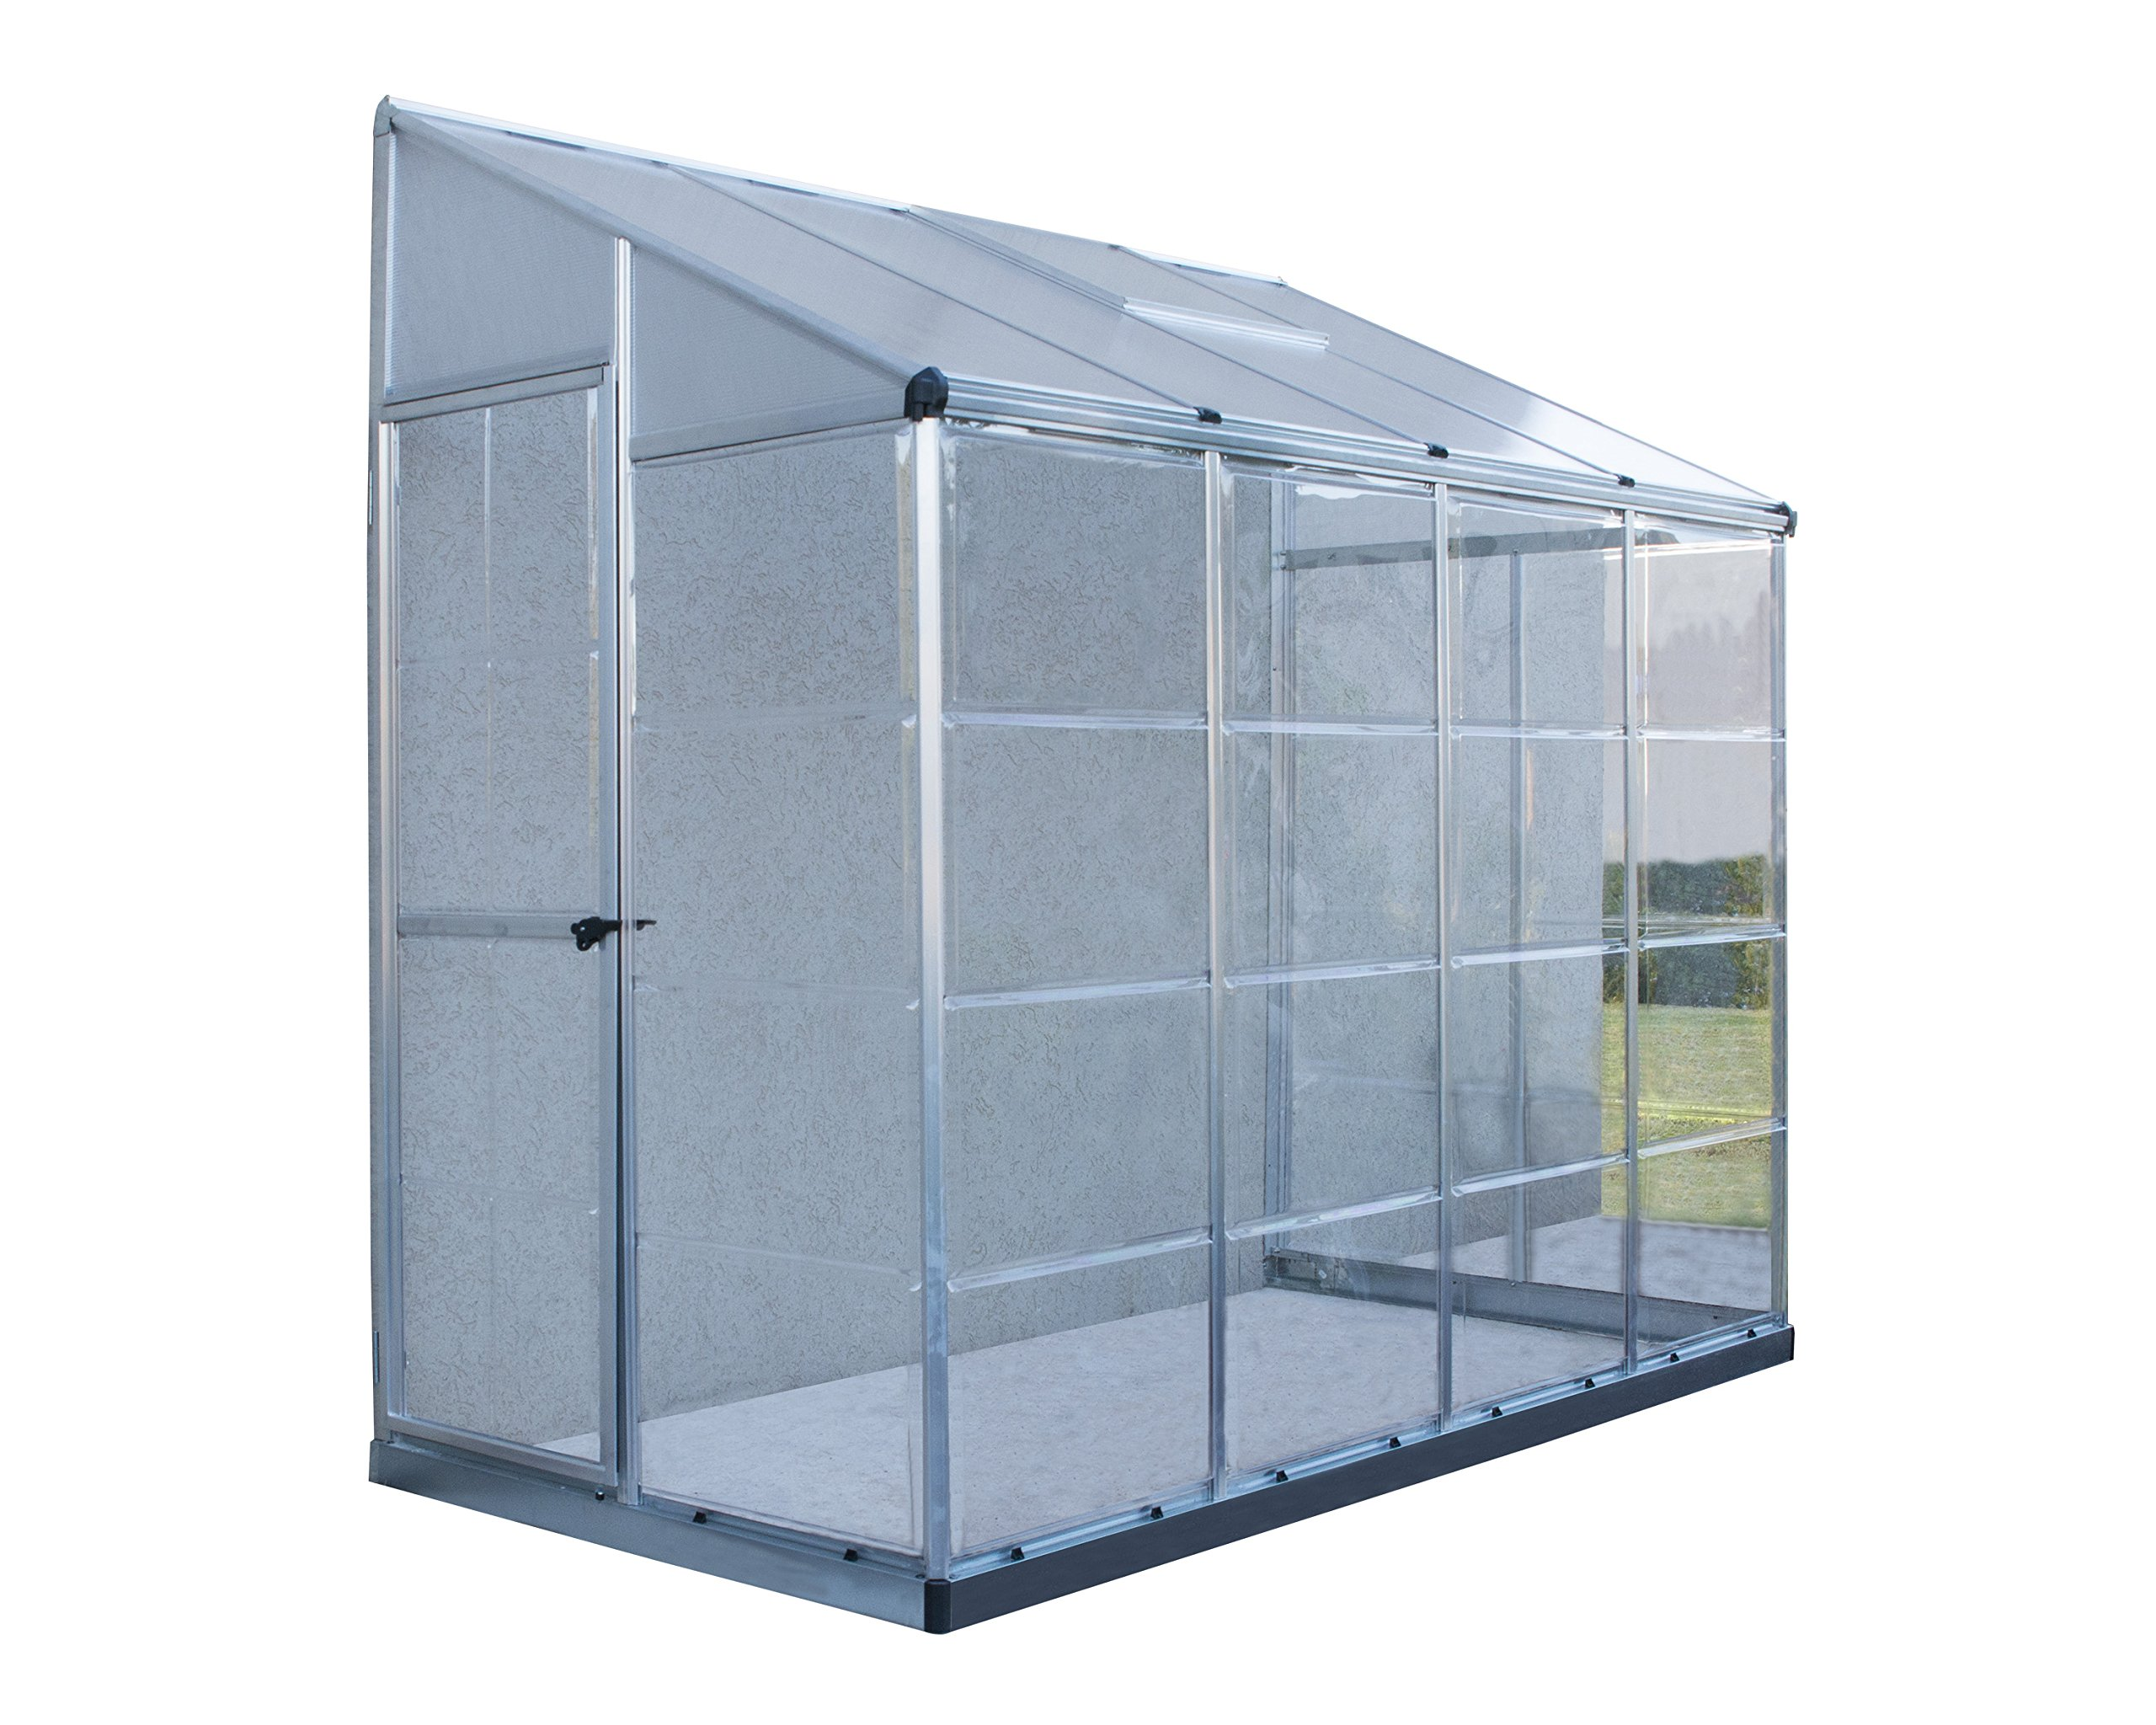 Palram Hybrid Lean-To Greenhouse - 4' x 8' by Palram